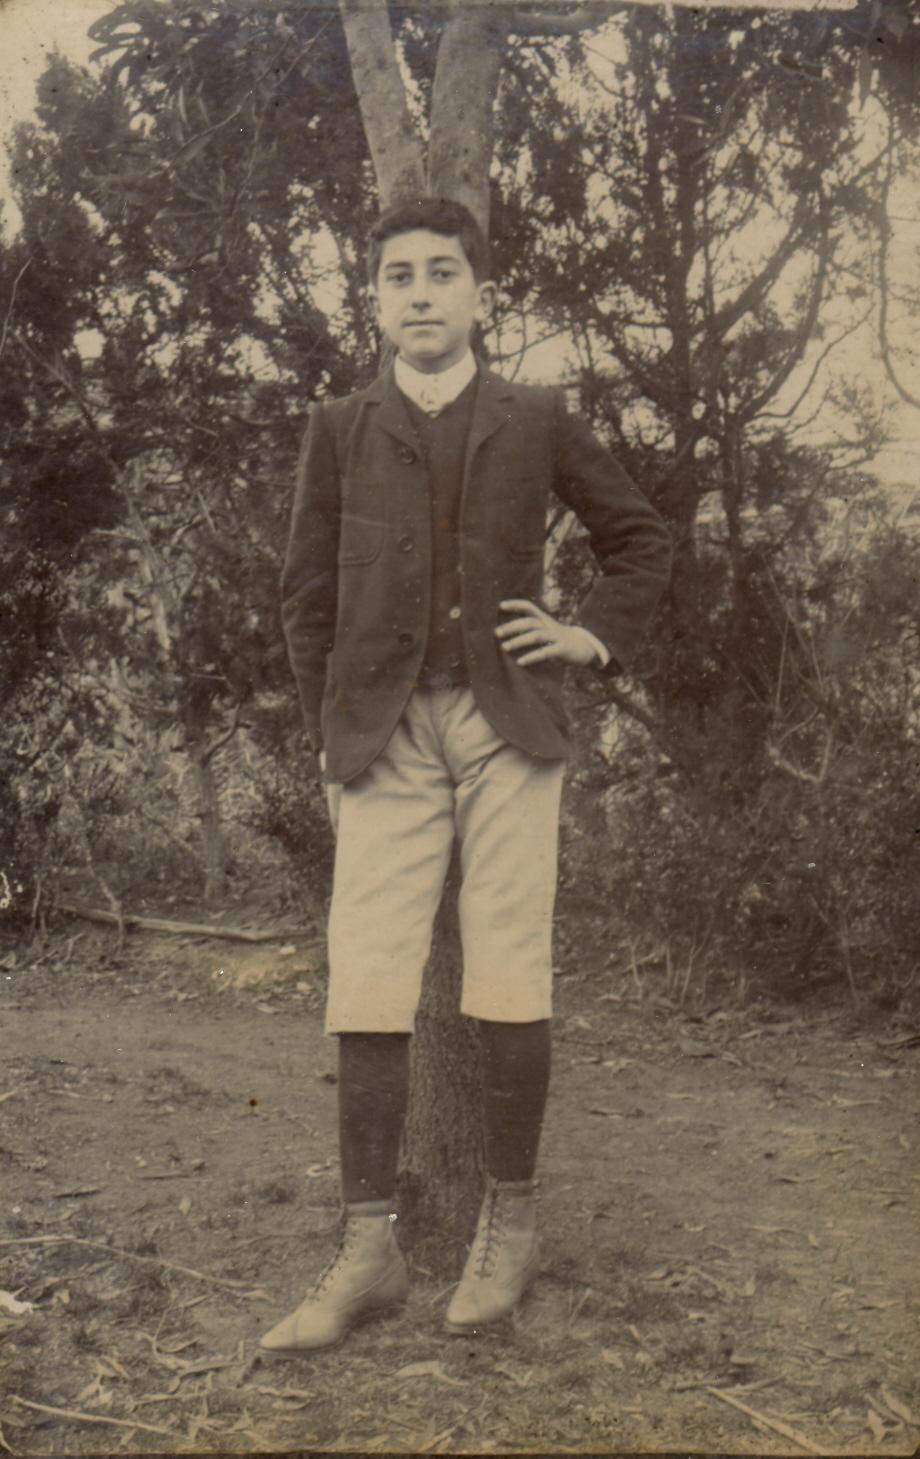 Domingos-Rebêlo-aos14-anos-Colégio-Fisher-1906 Azores Artist